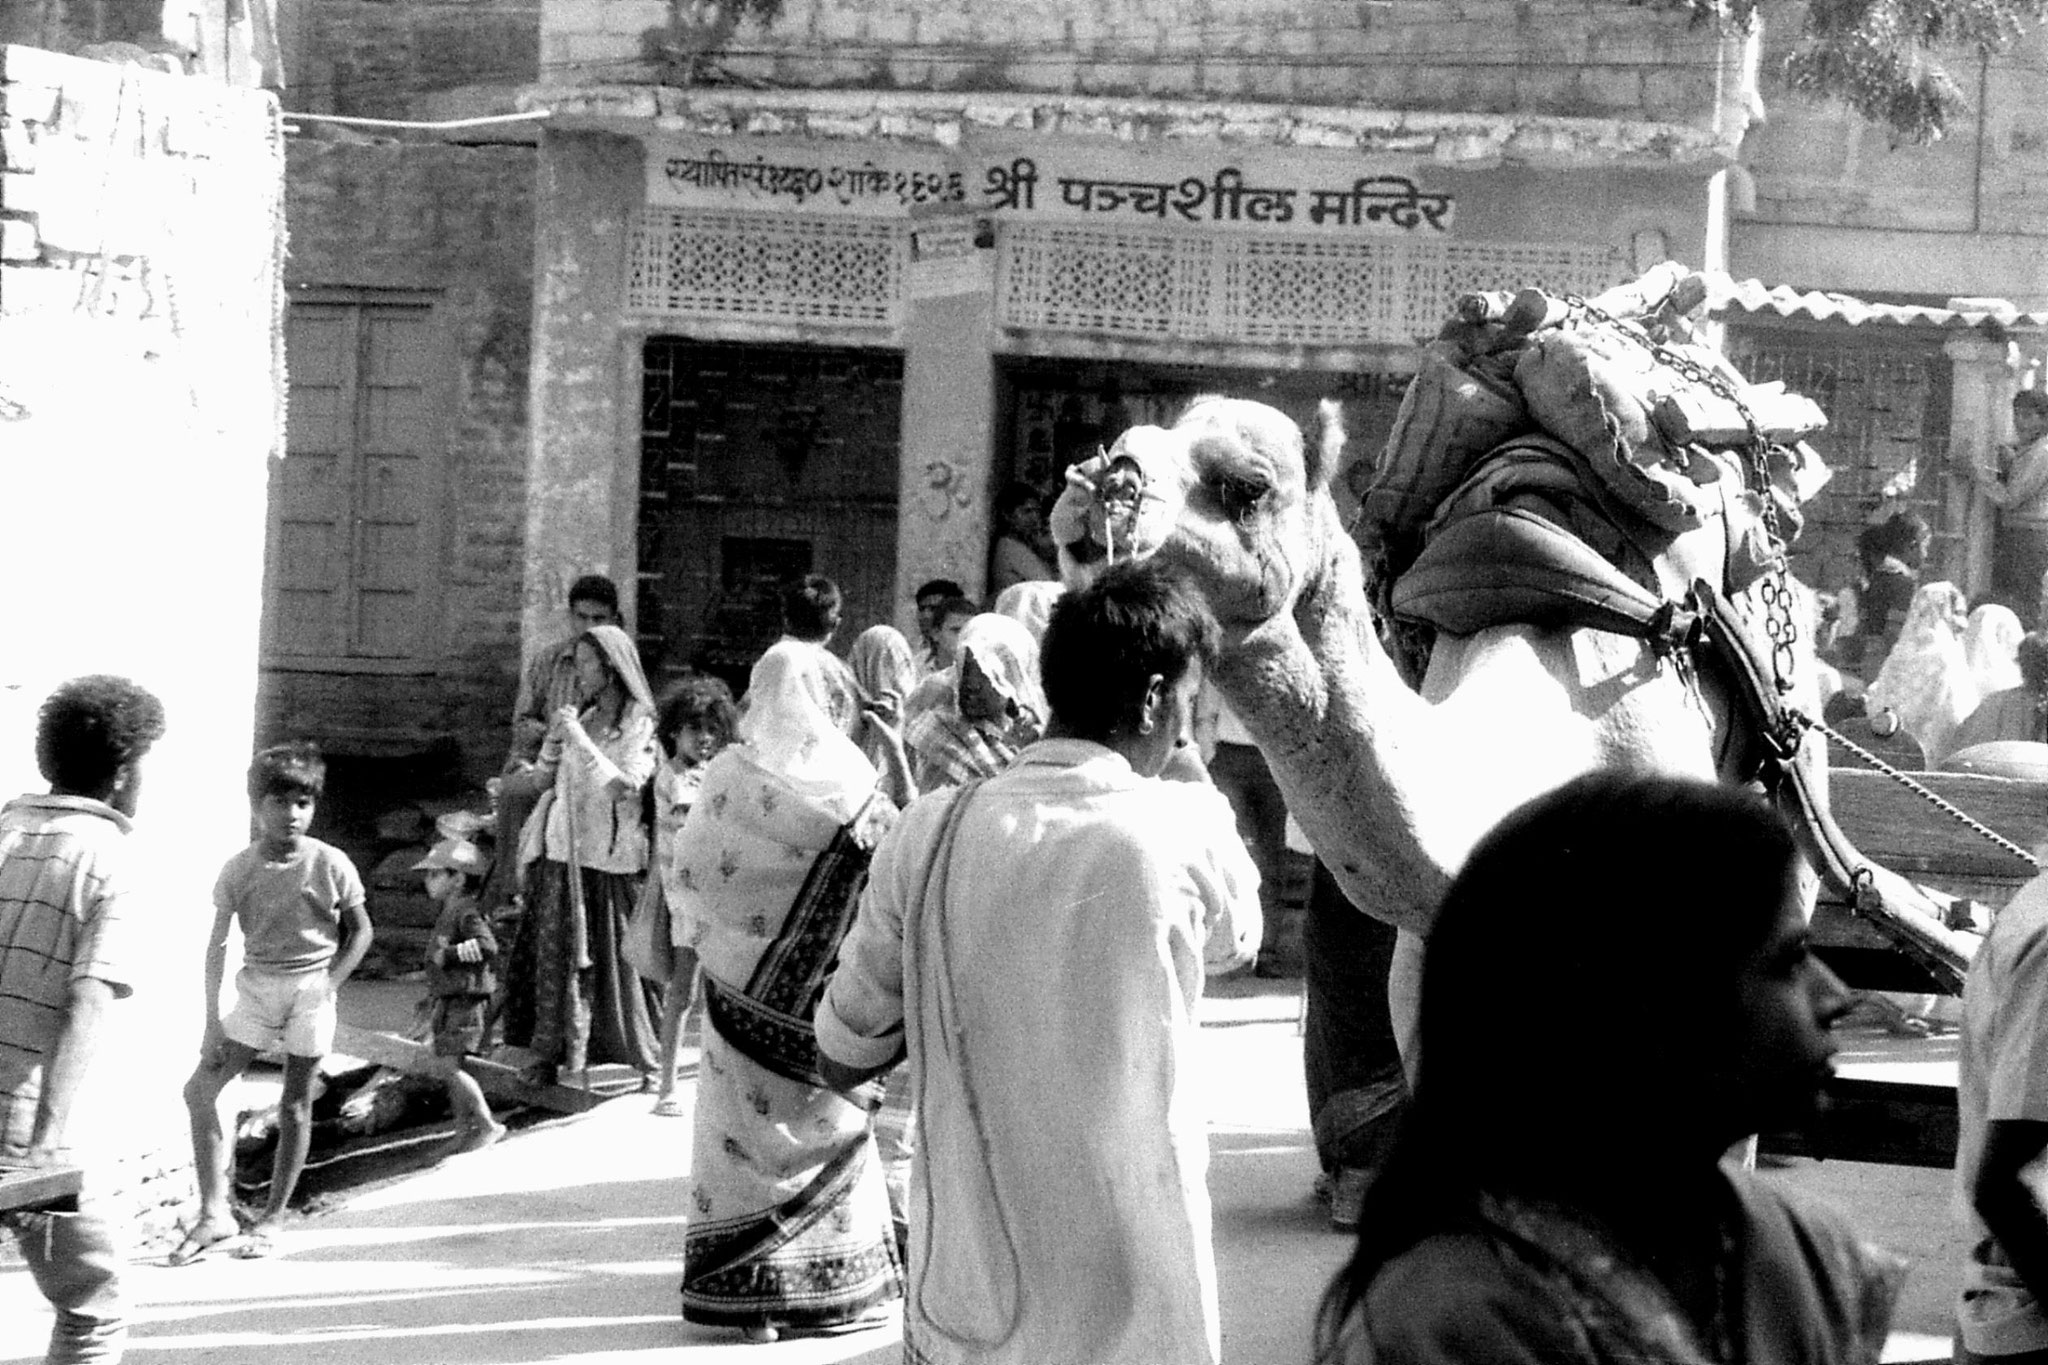 3/12/1989: 34: Jaisalmer camel and wedding procession